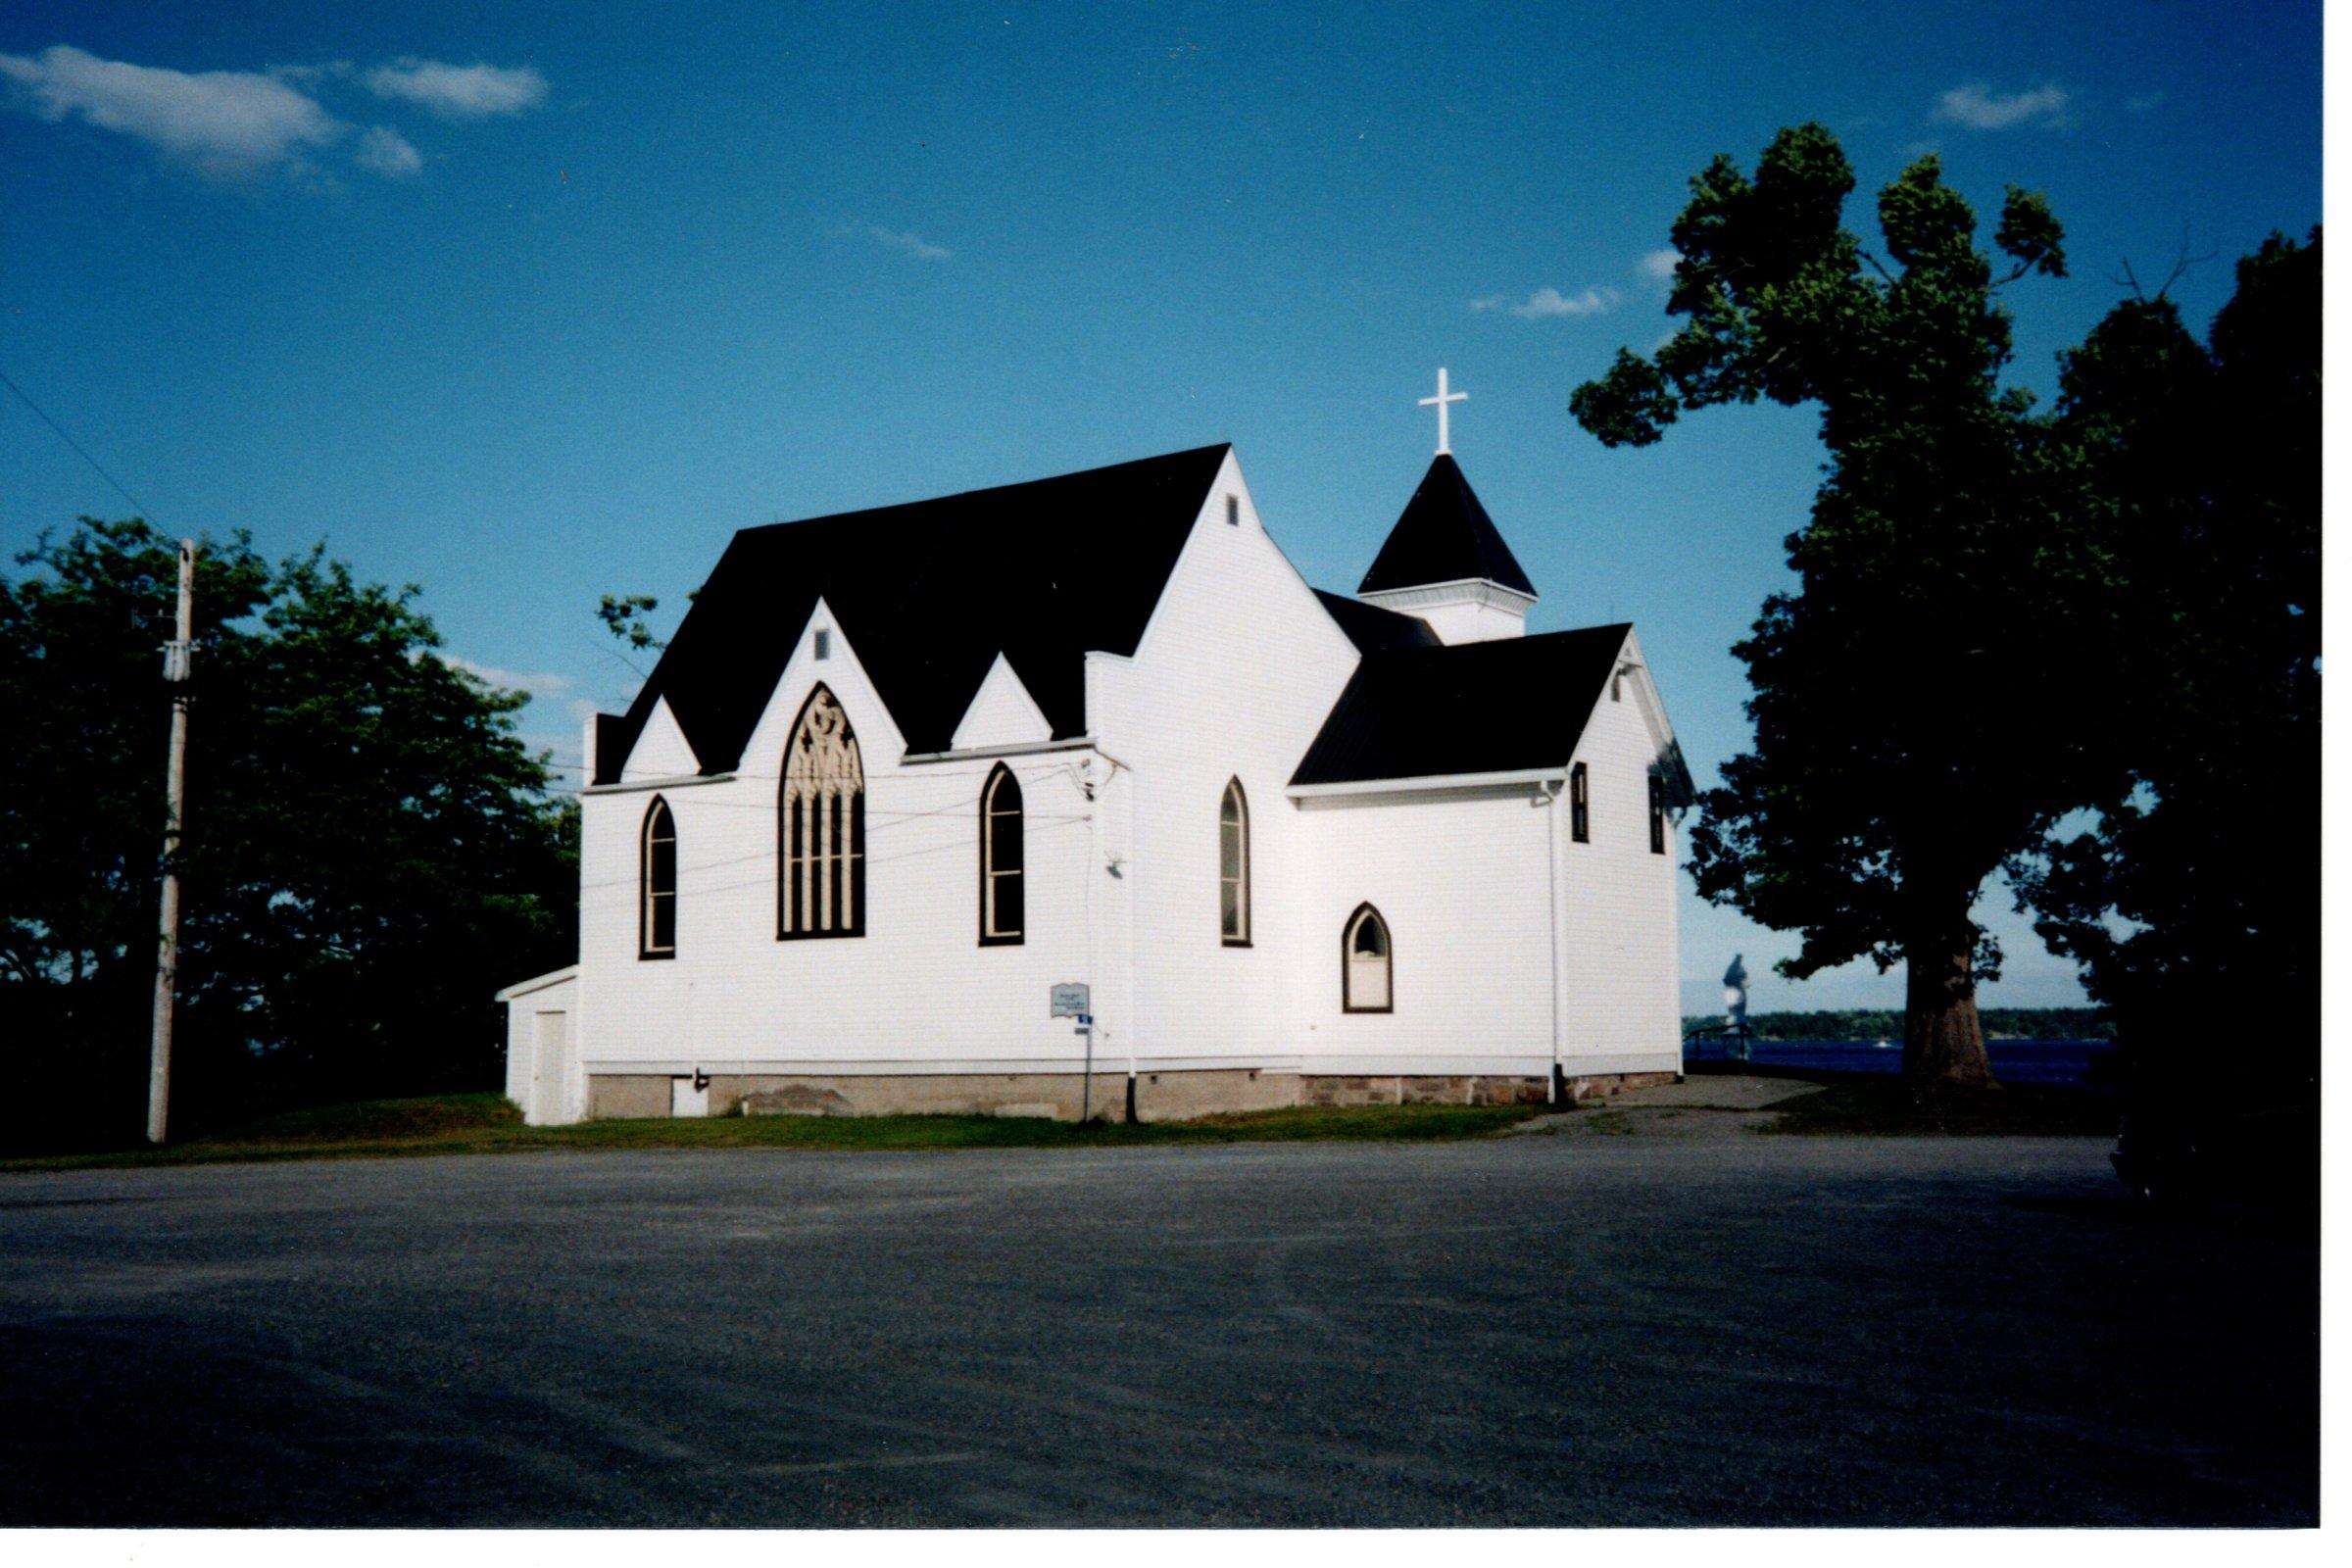 St. Brendan's parking lot view of church